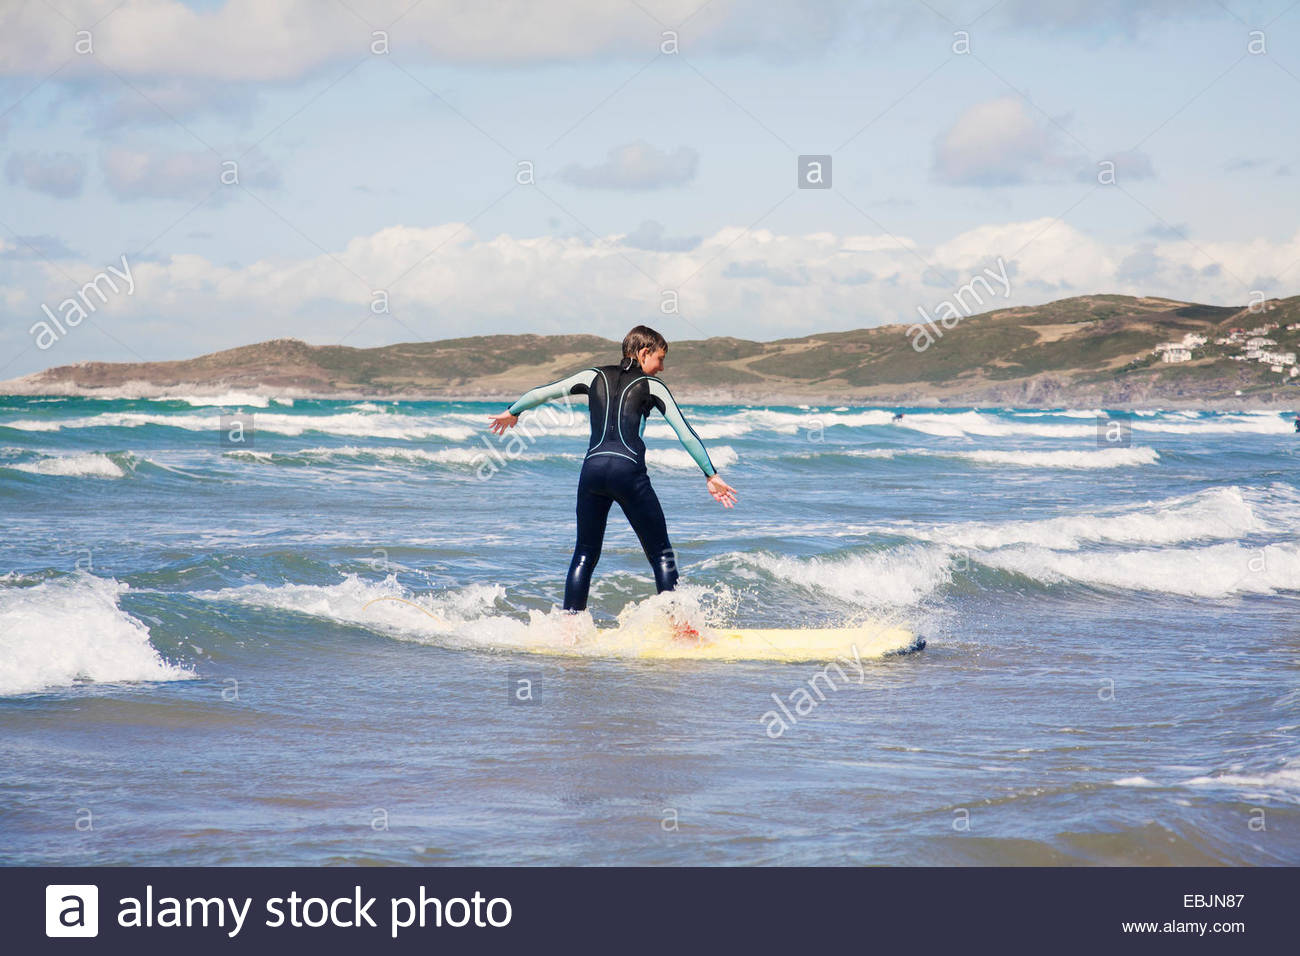 Boy surfing - Stock Image